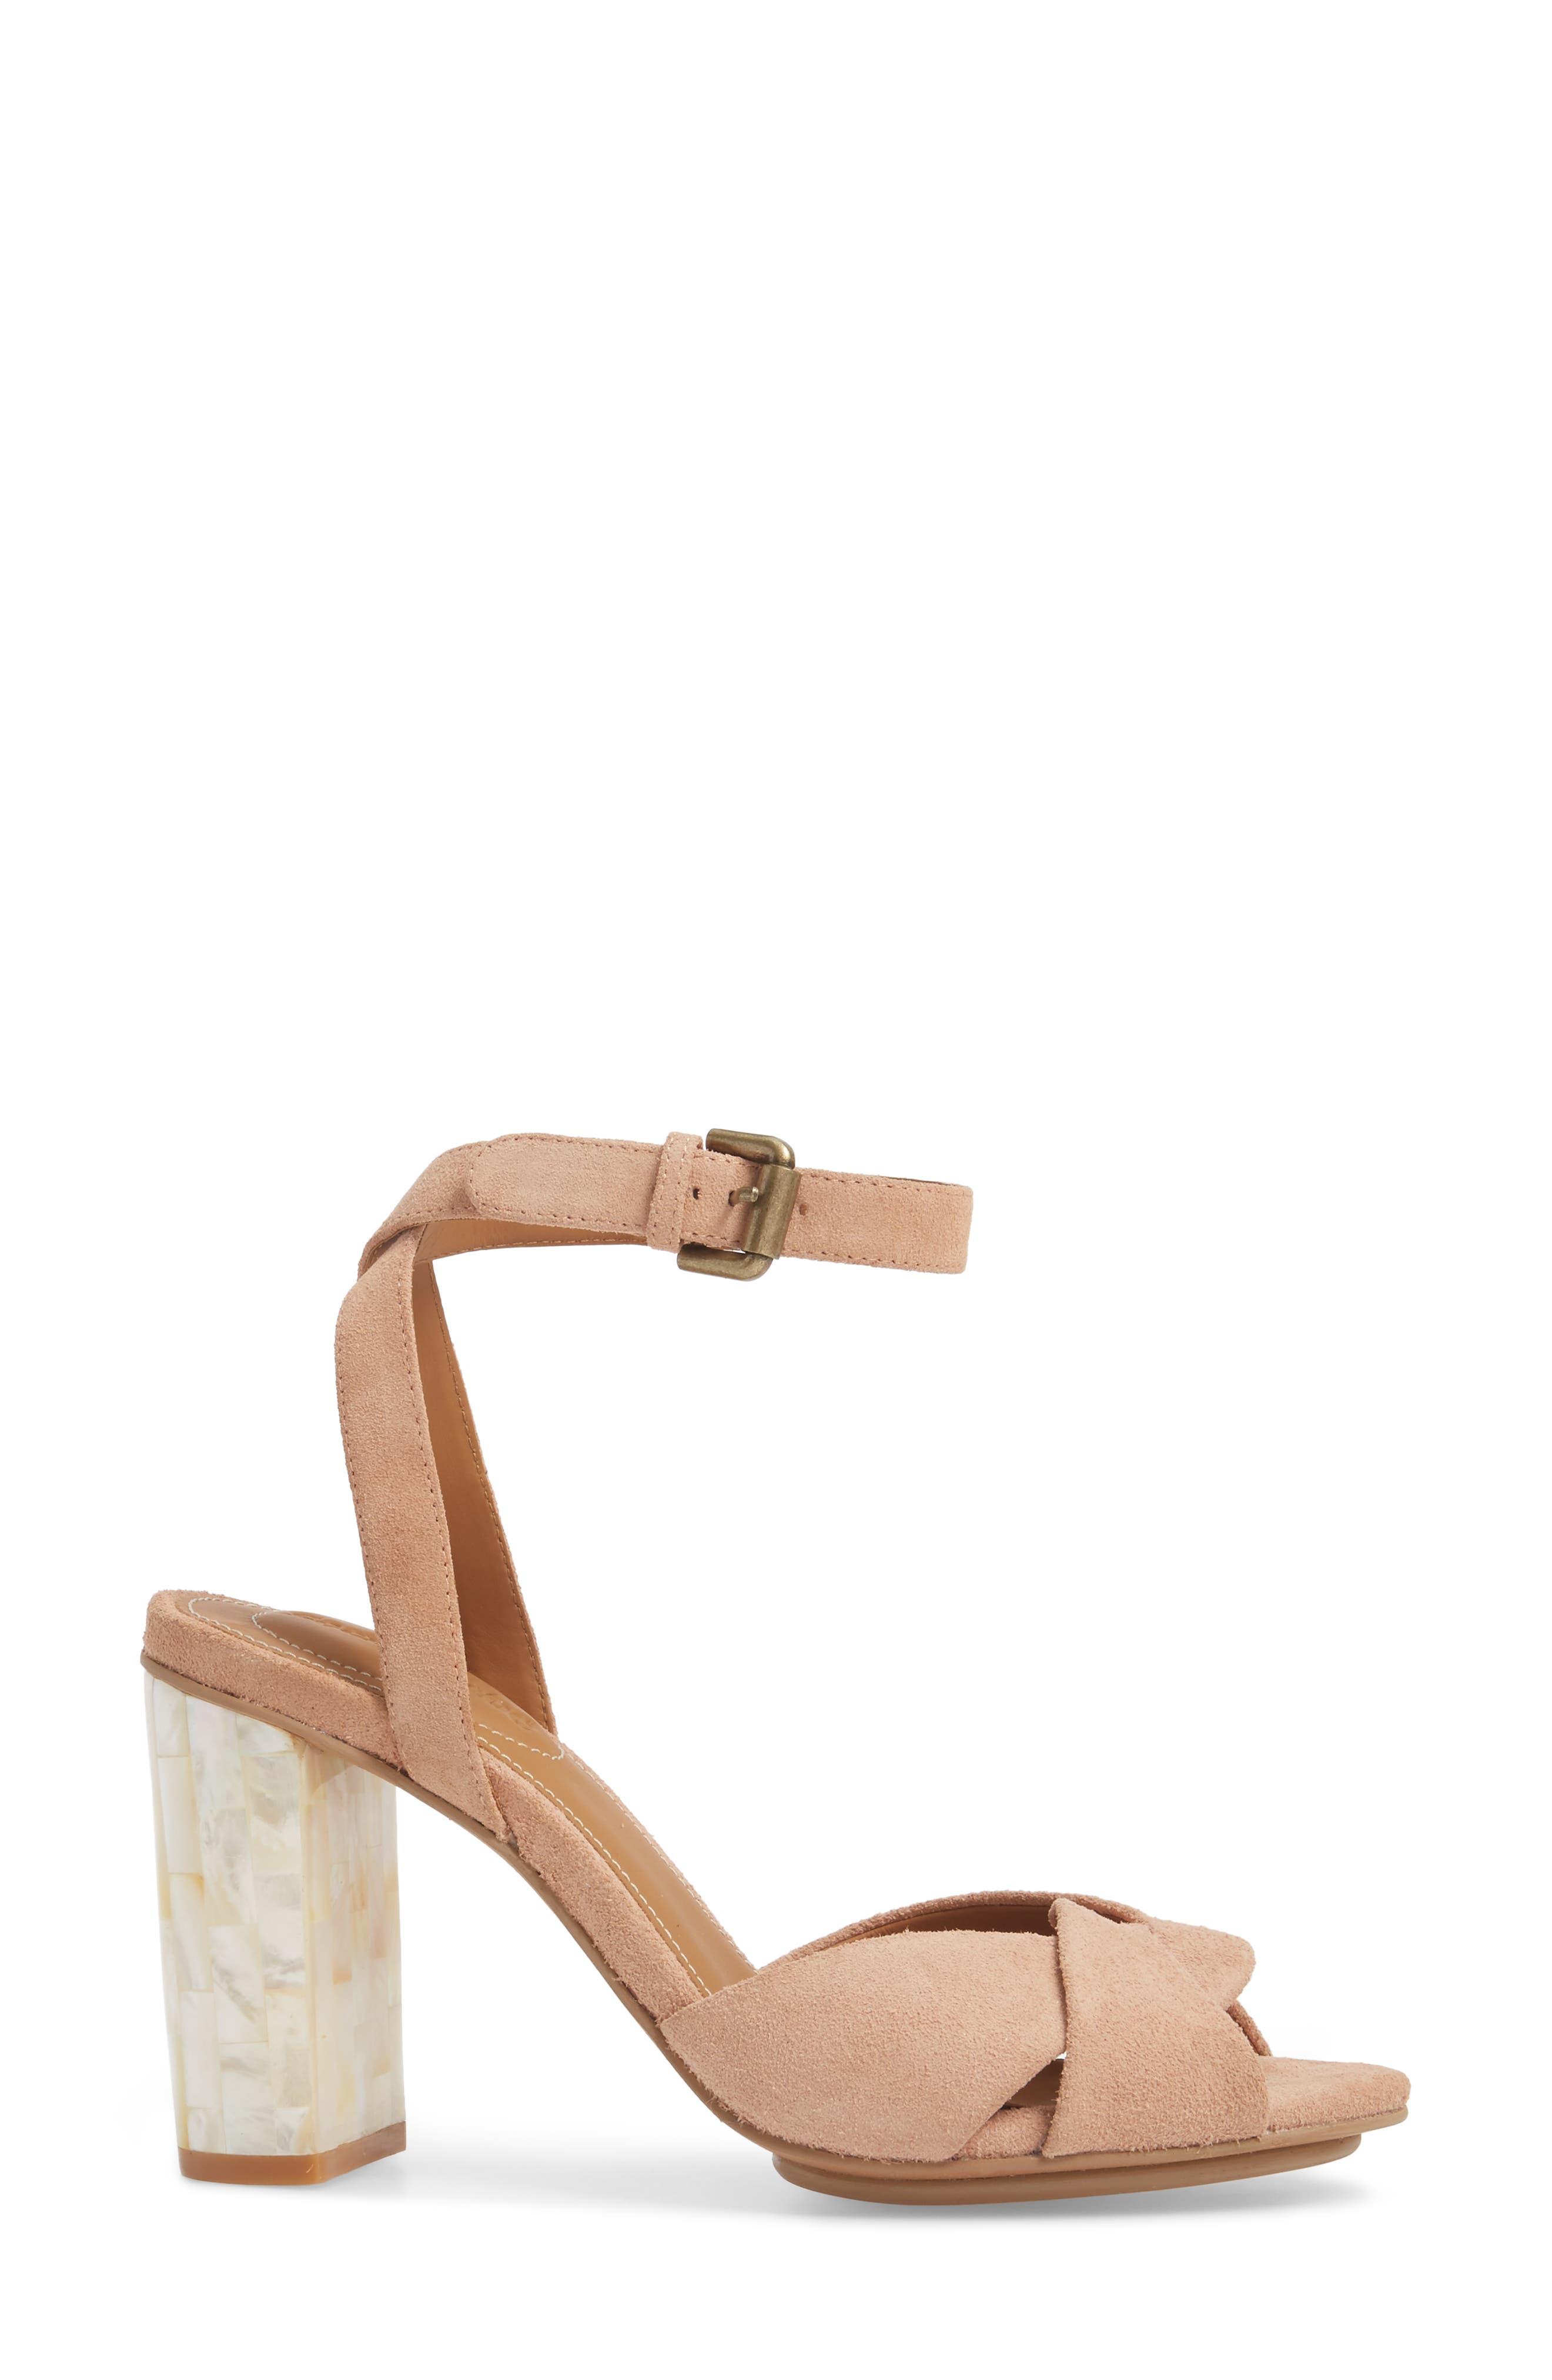 Isida Block Heel Sandal,                             Alternate thumbnail 3, color,                             210